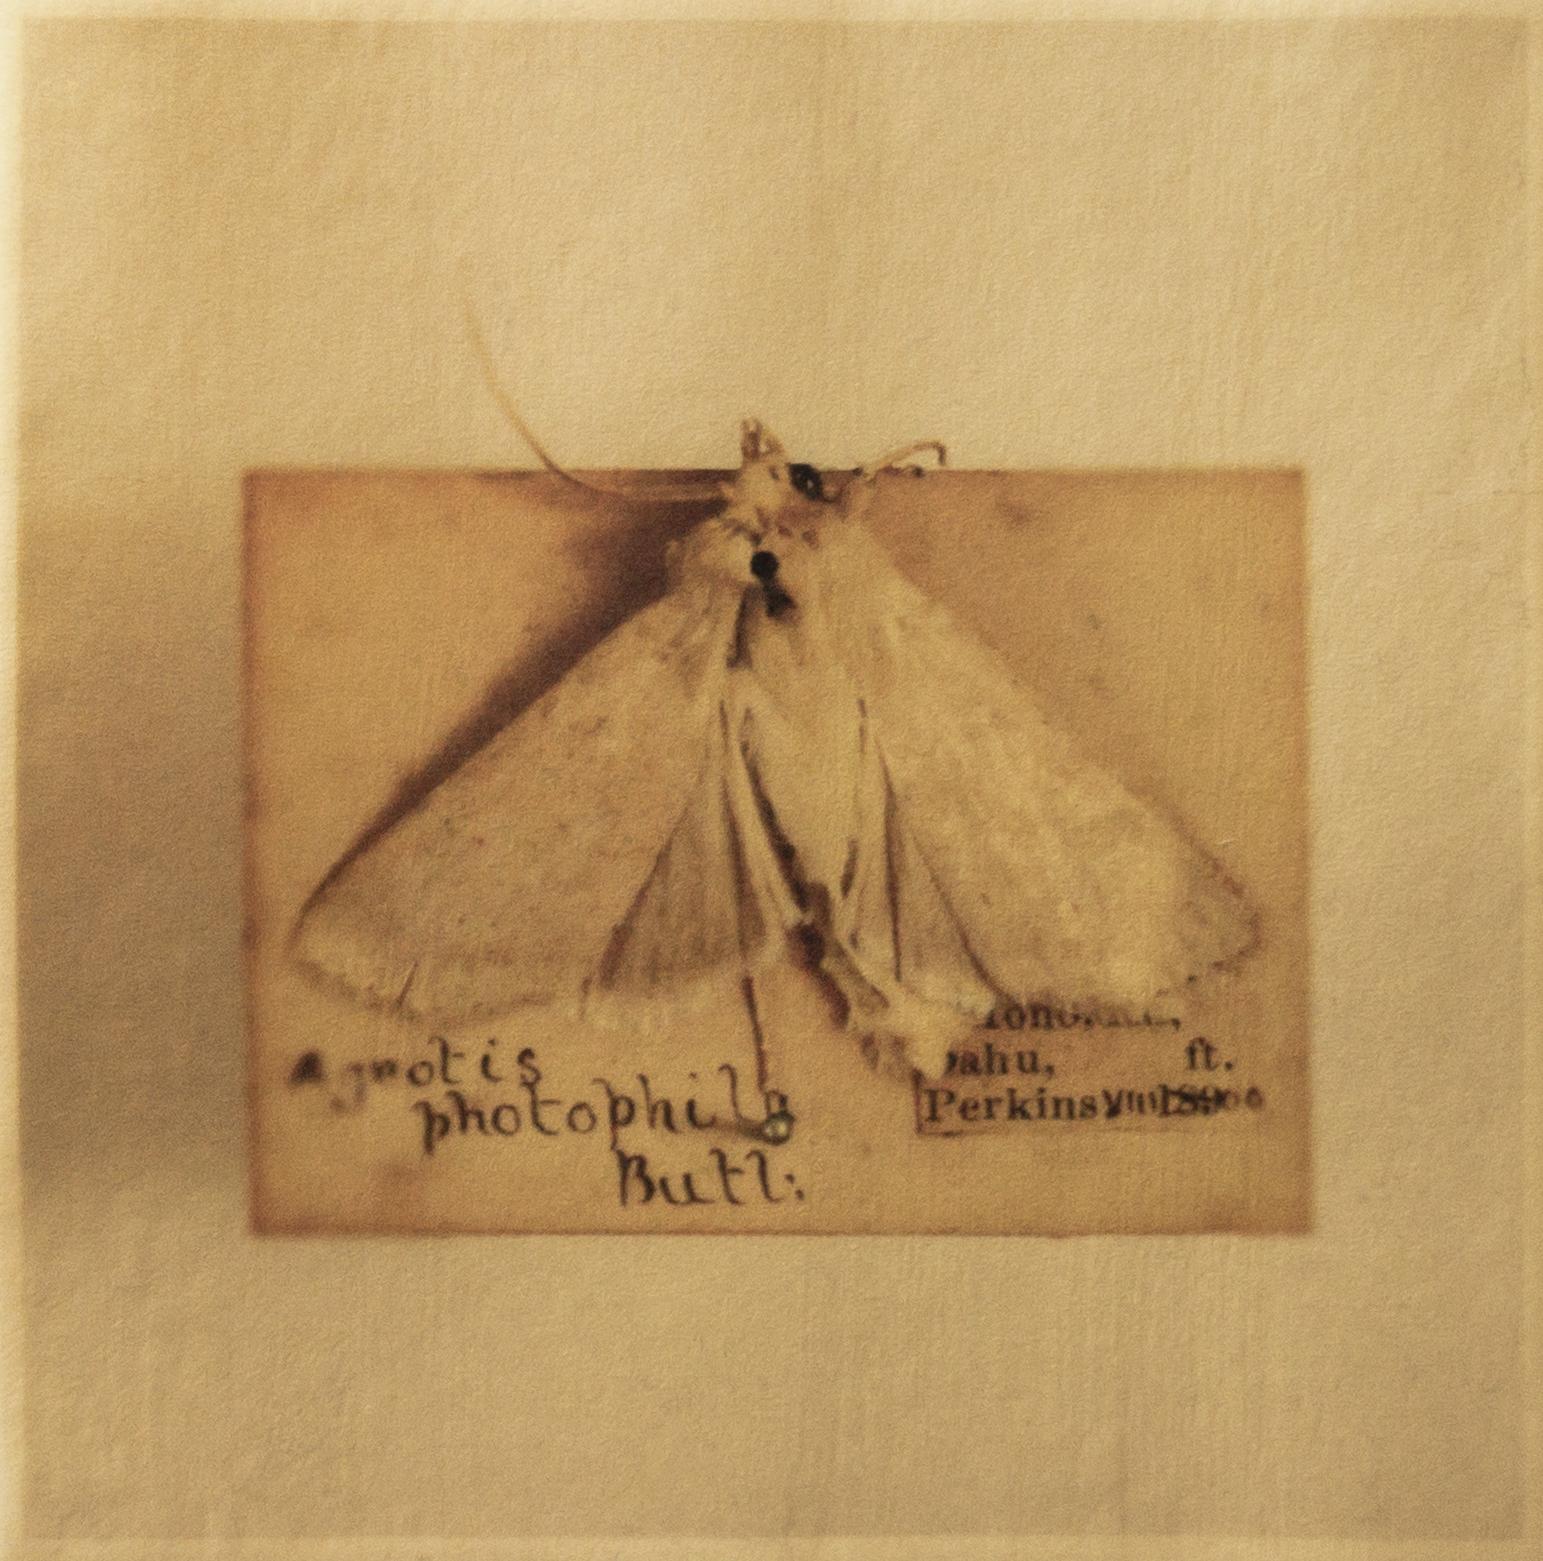 Agrotis photophila